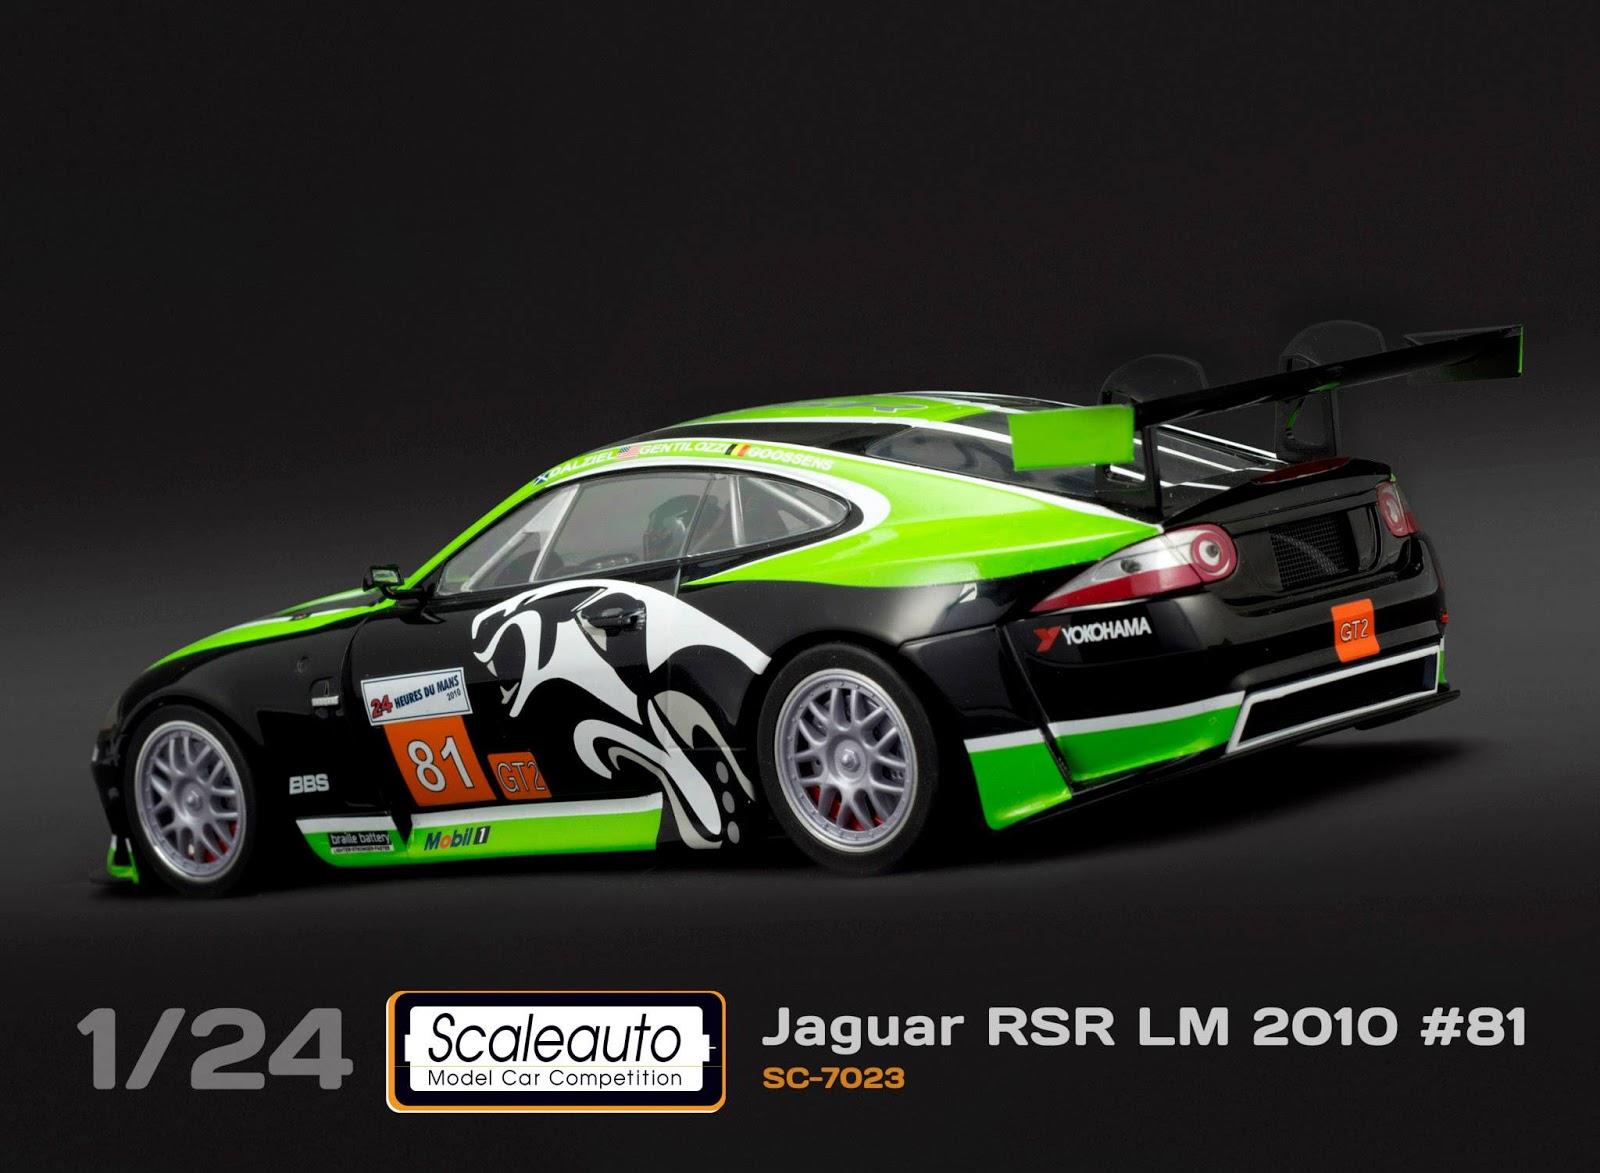 ManicSlots' slot cars and scenery: NEWS: Scaleauto Jaguar RSR GT2